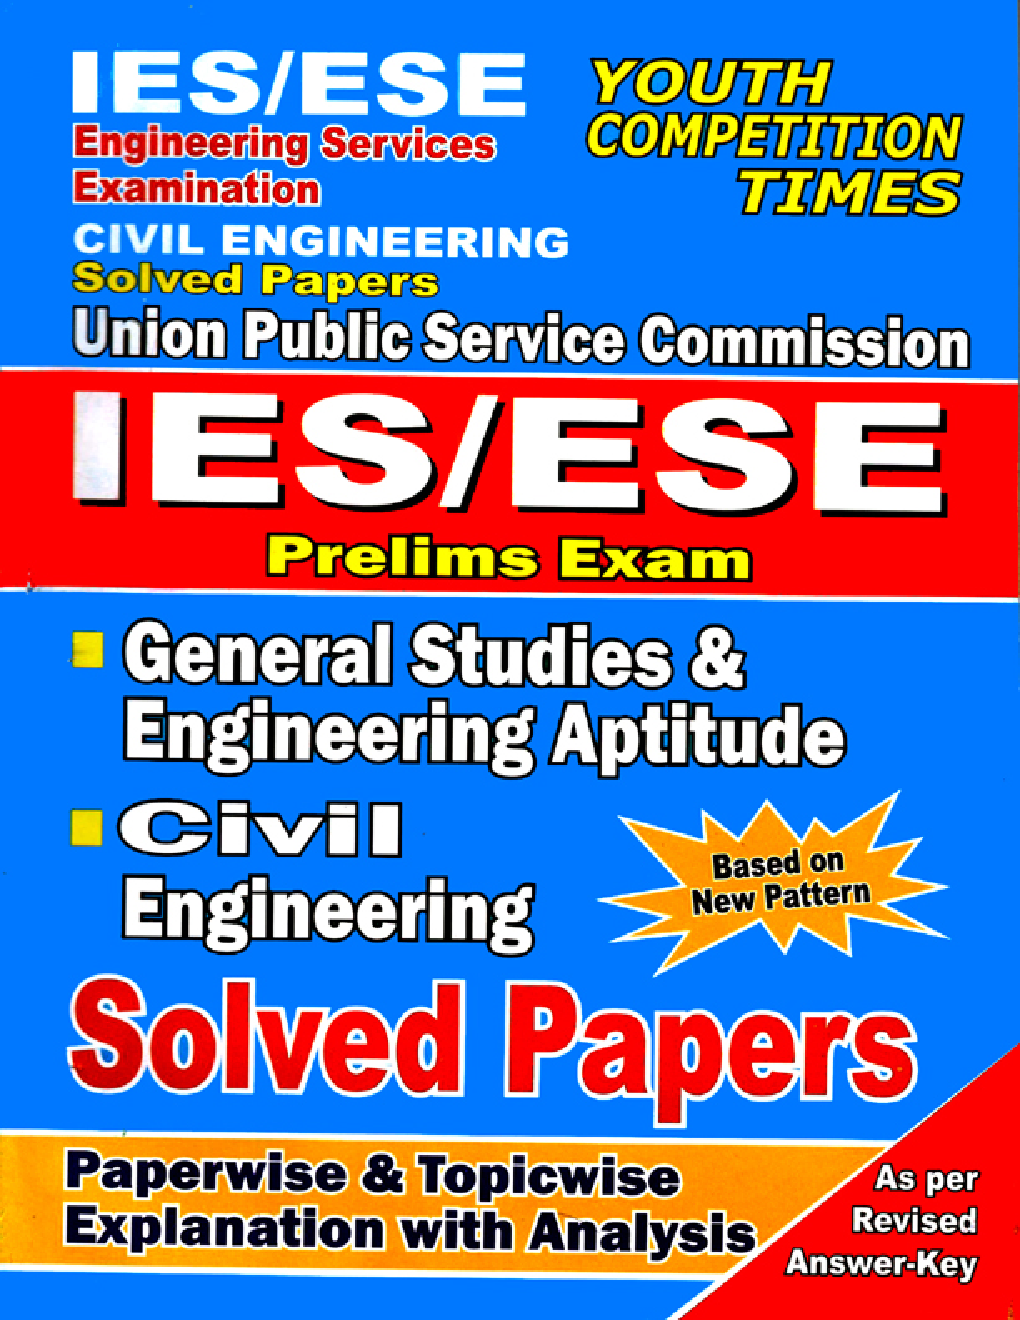 IES /ESE Prelims Exam Civil Engineering & General Studies And Engineering Apptitude Solved Papers  - Page 1